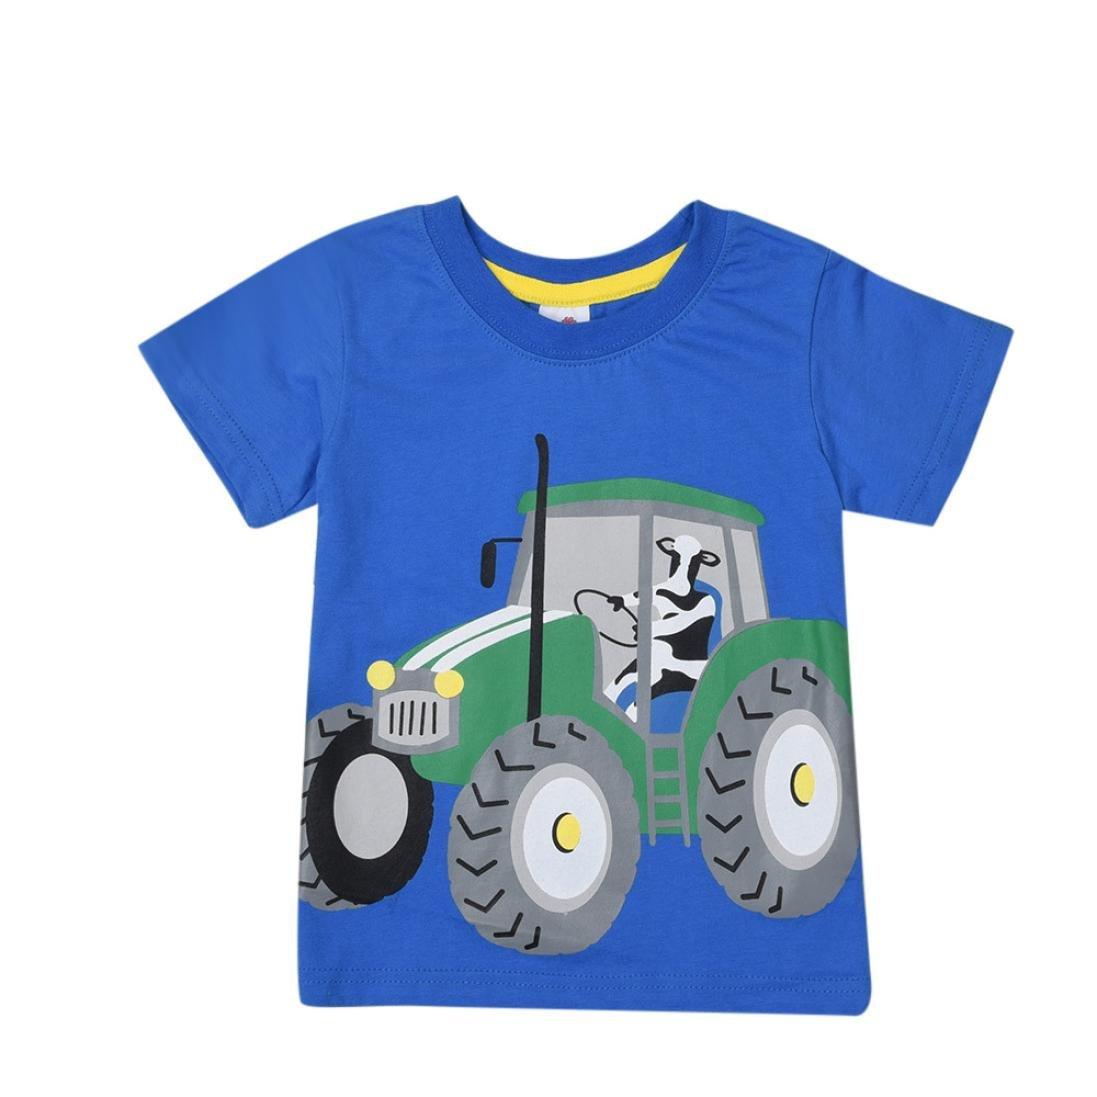 Baby T-Shirt, for 1-8 Years Old Cute Newborn Baby Boys Short Sleeve Car Print T-Shirt Blouse Tee Tops Summer Clothes ClodeEU-02